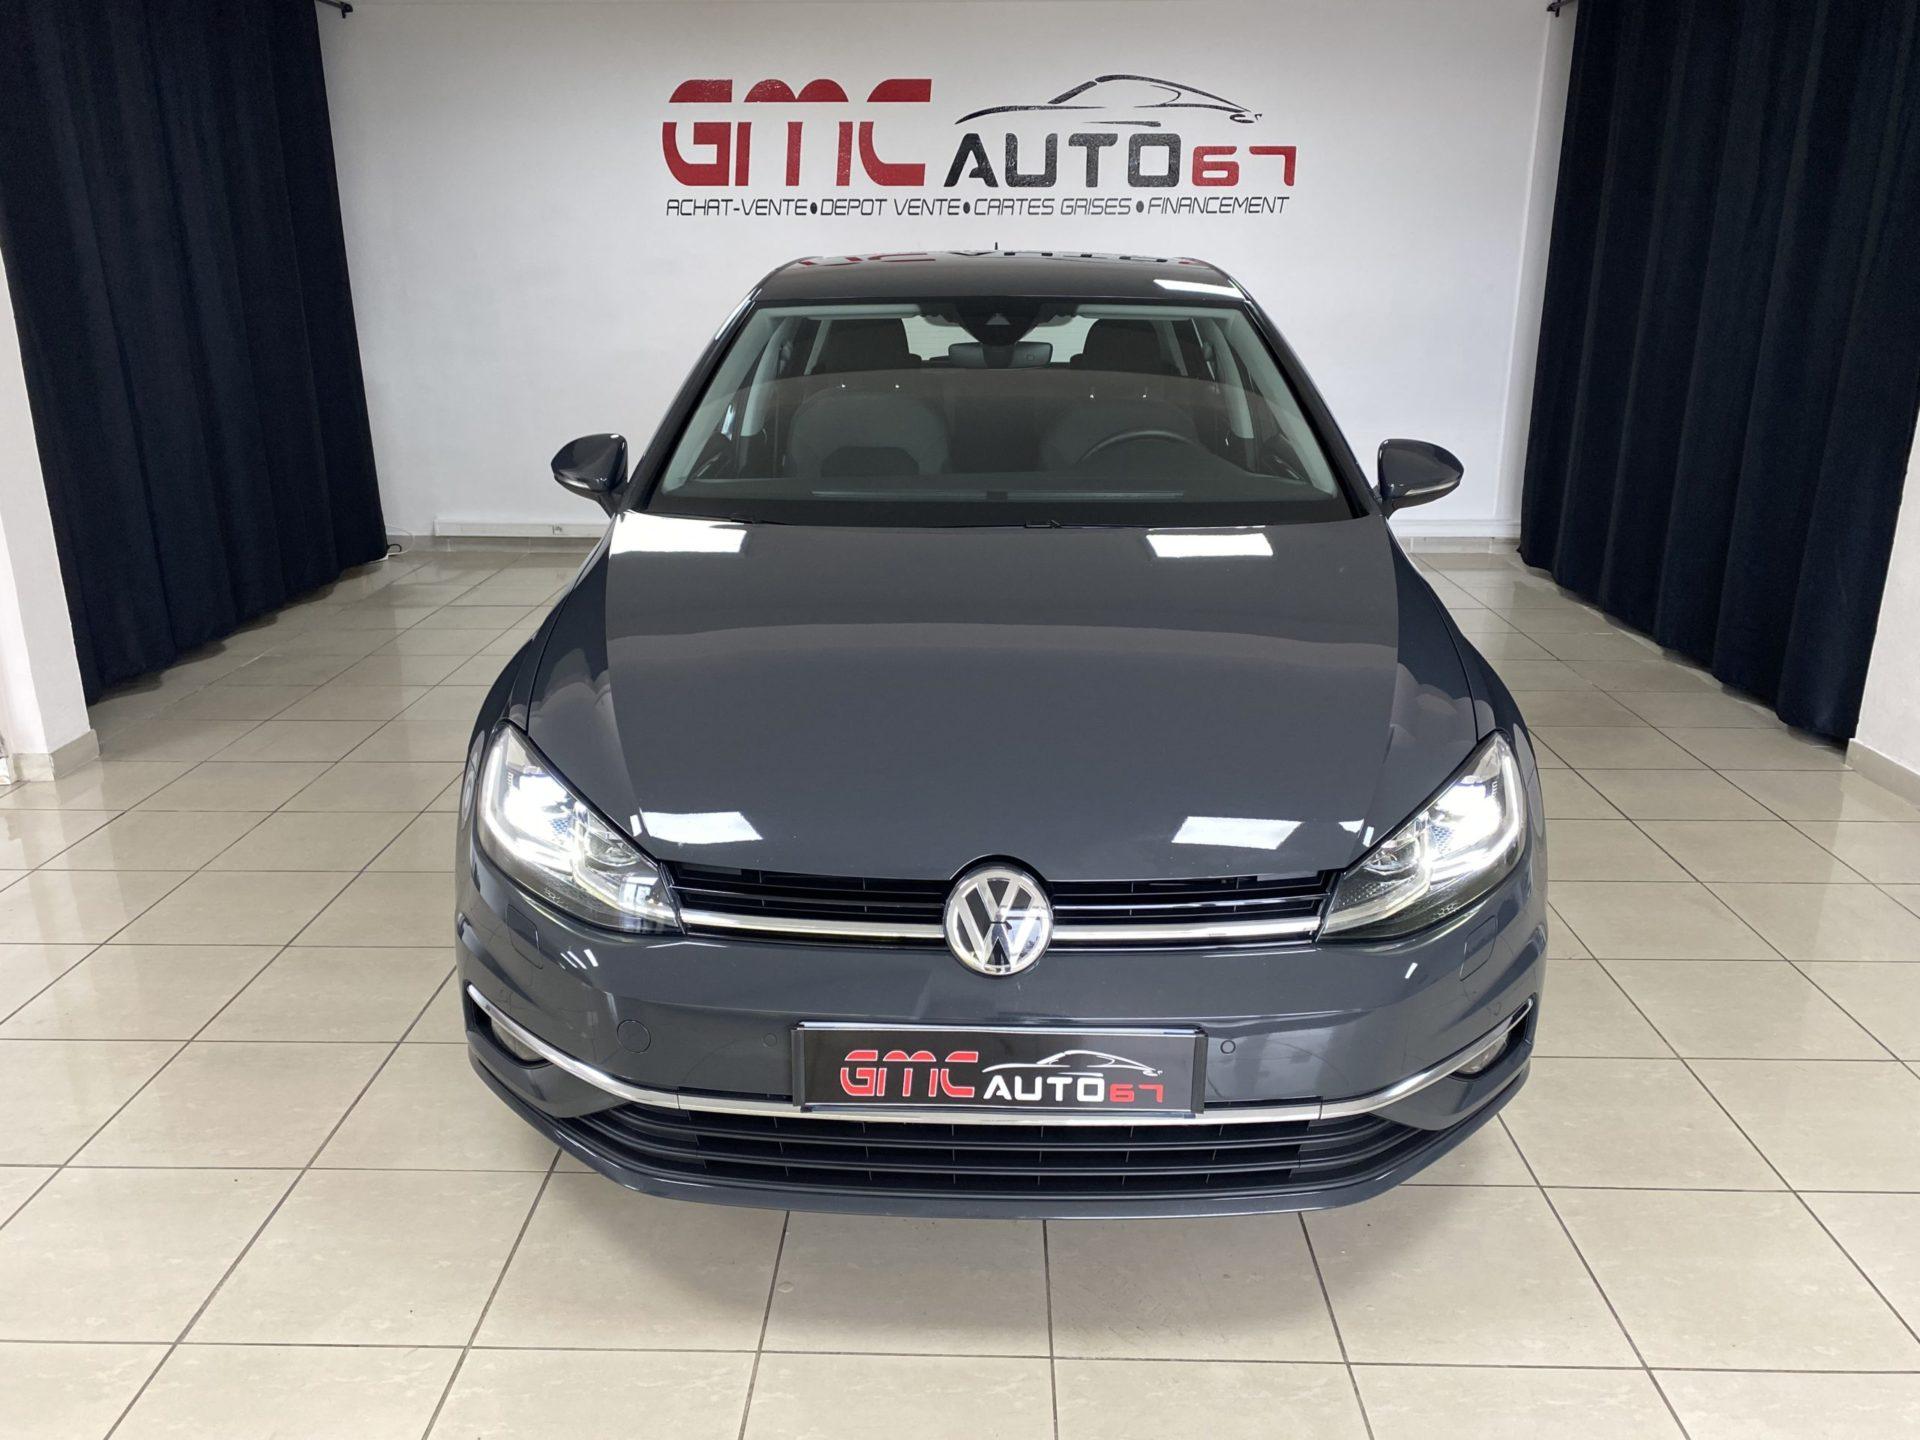 GMC AUTO 67 - Volkswagen Golf 2.0 TDI 150 BlueMotion Technology FAP DSG7 Carat